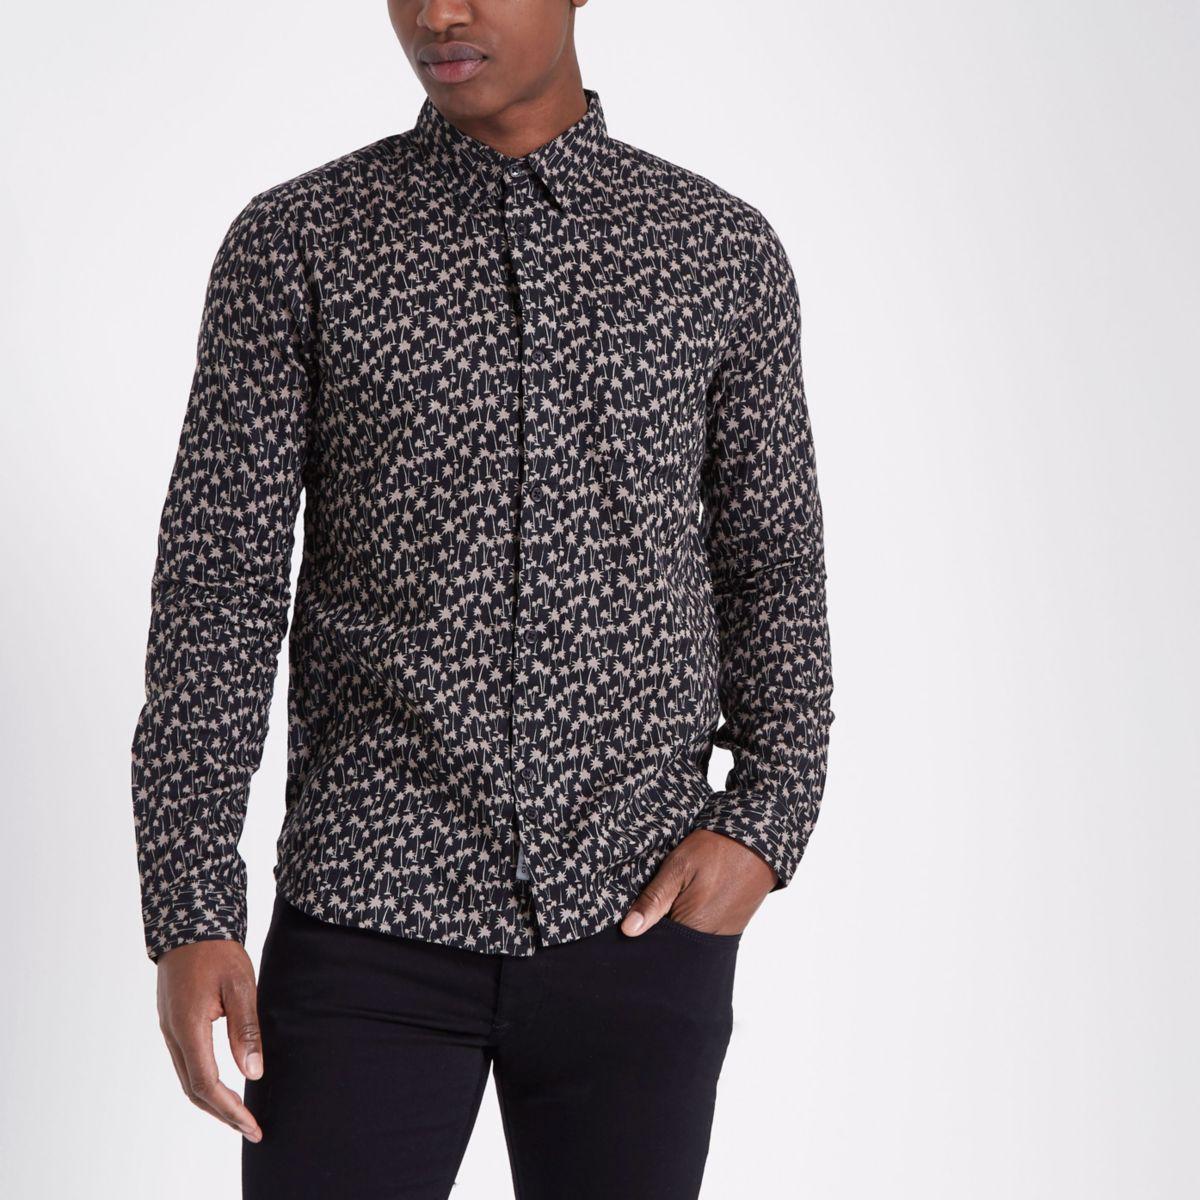 Bellfield - Zwart overhemd met palmenprint en lange mouwen